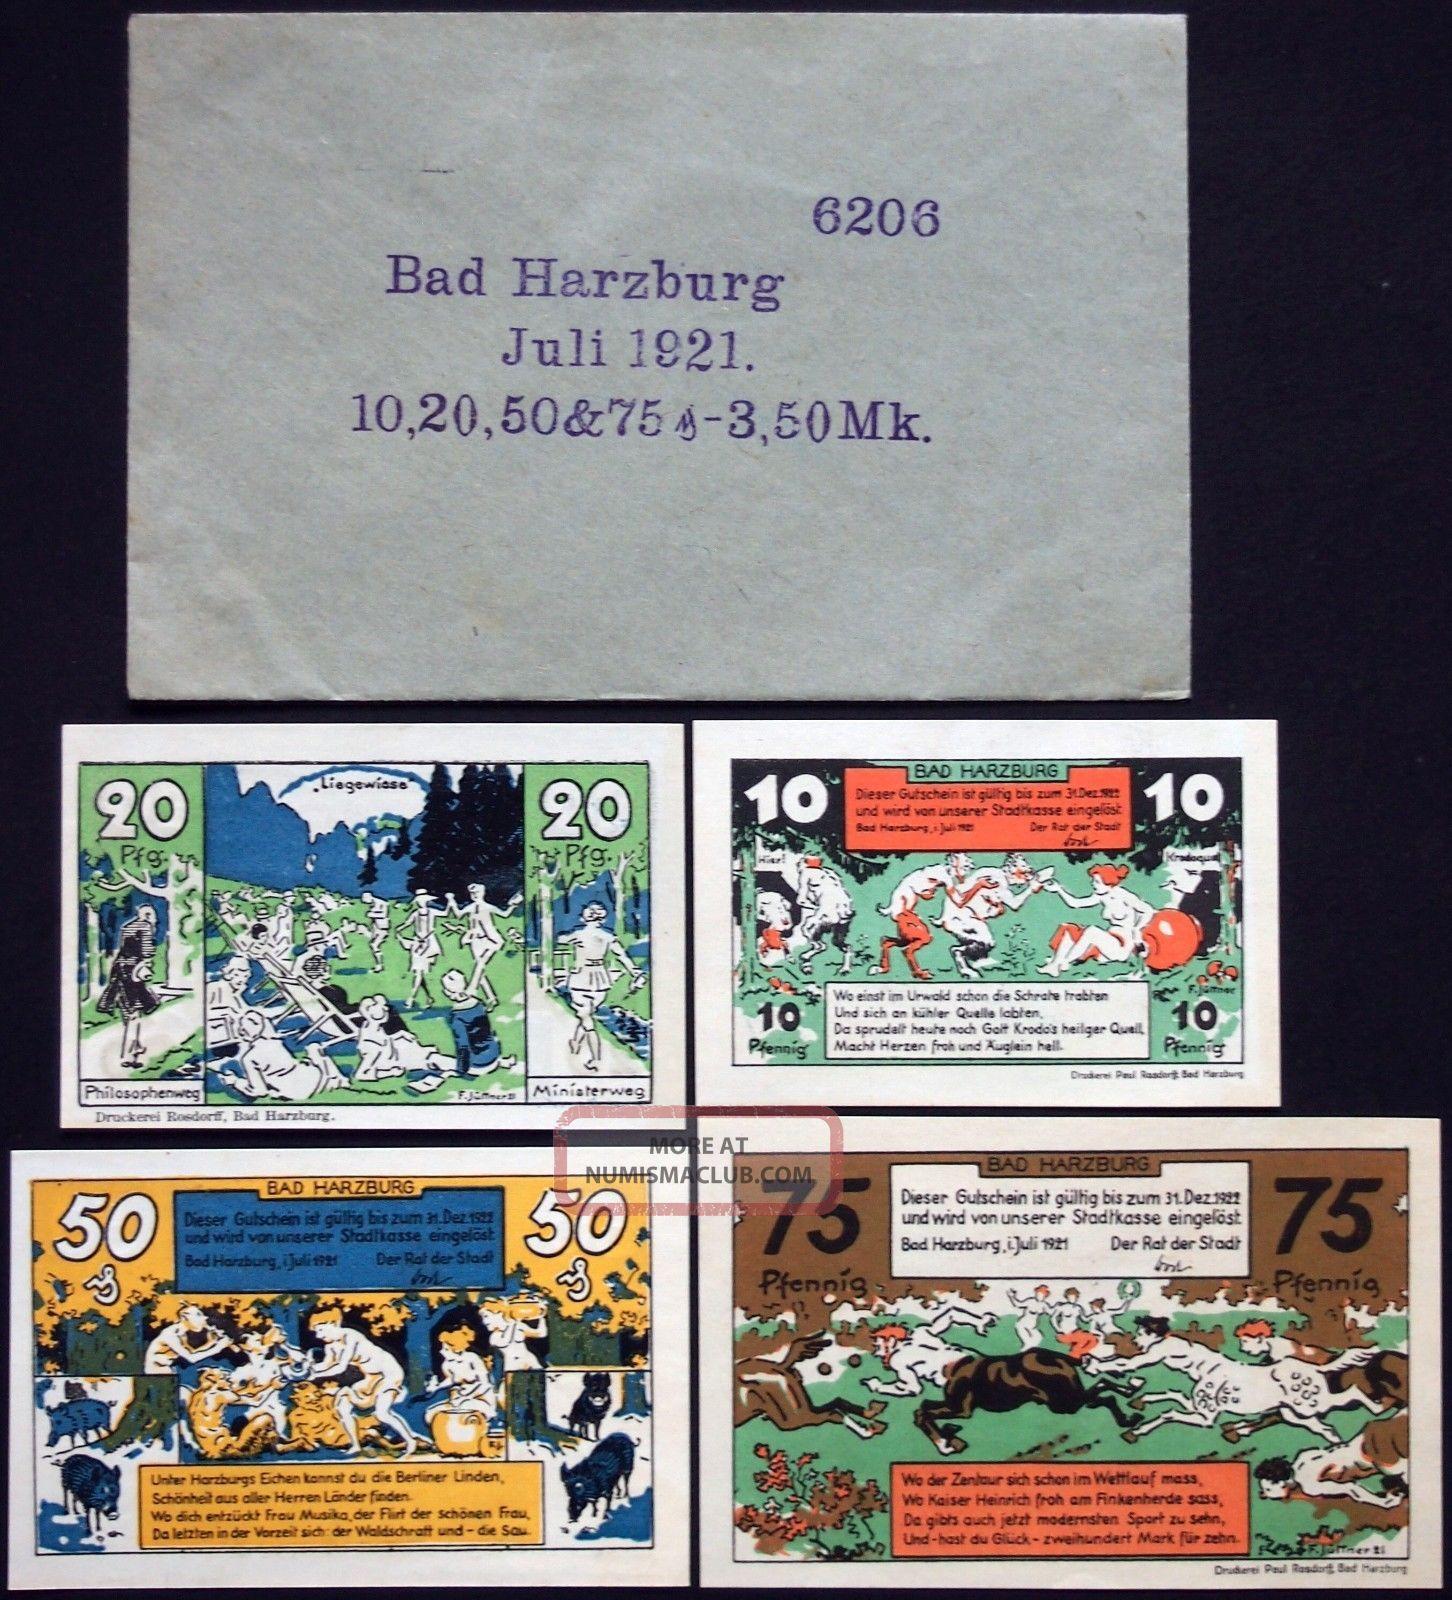 Bad Harzburg 1921 Complete Series In Rare Robert Ball Envelope German Notgeld Europe photo